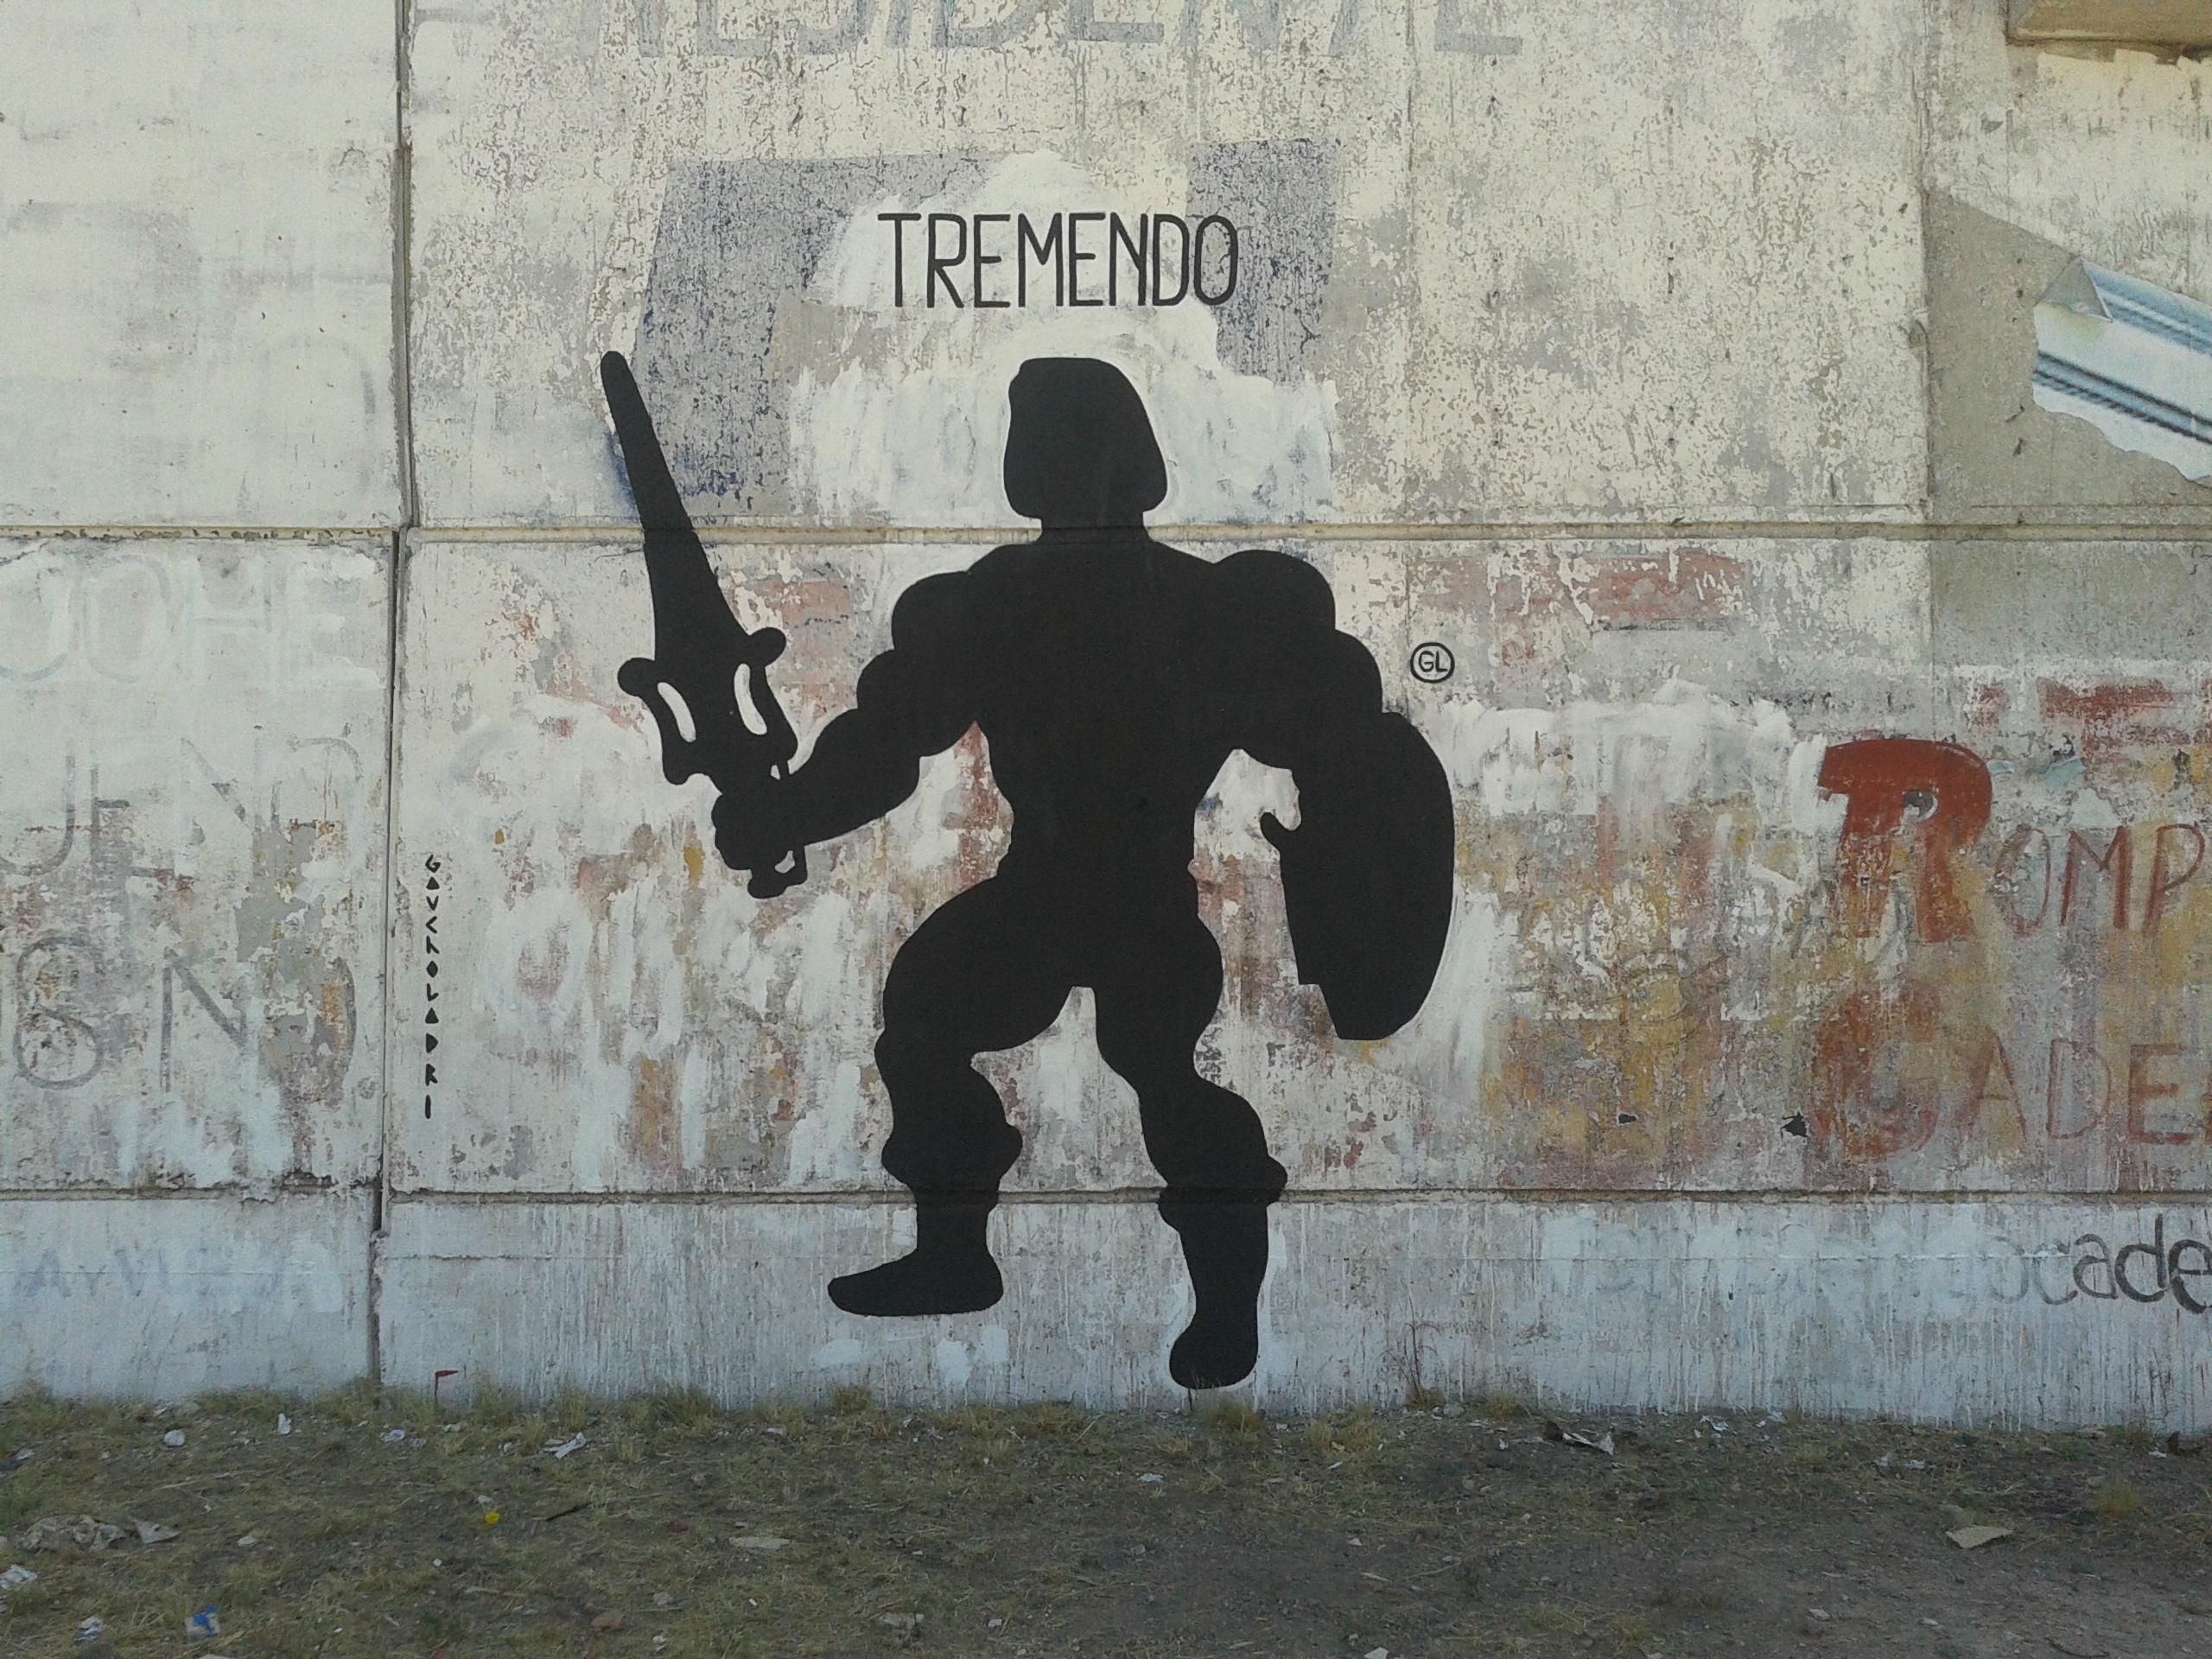 gaucholadri-tremendo-a-new-mural-in-mendoza-argentina-00